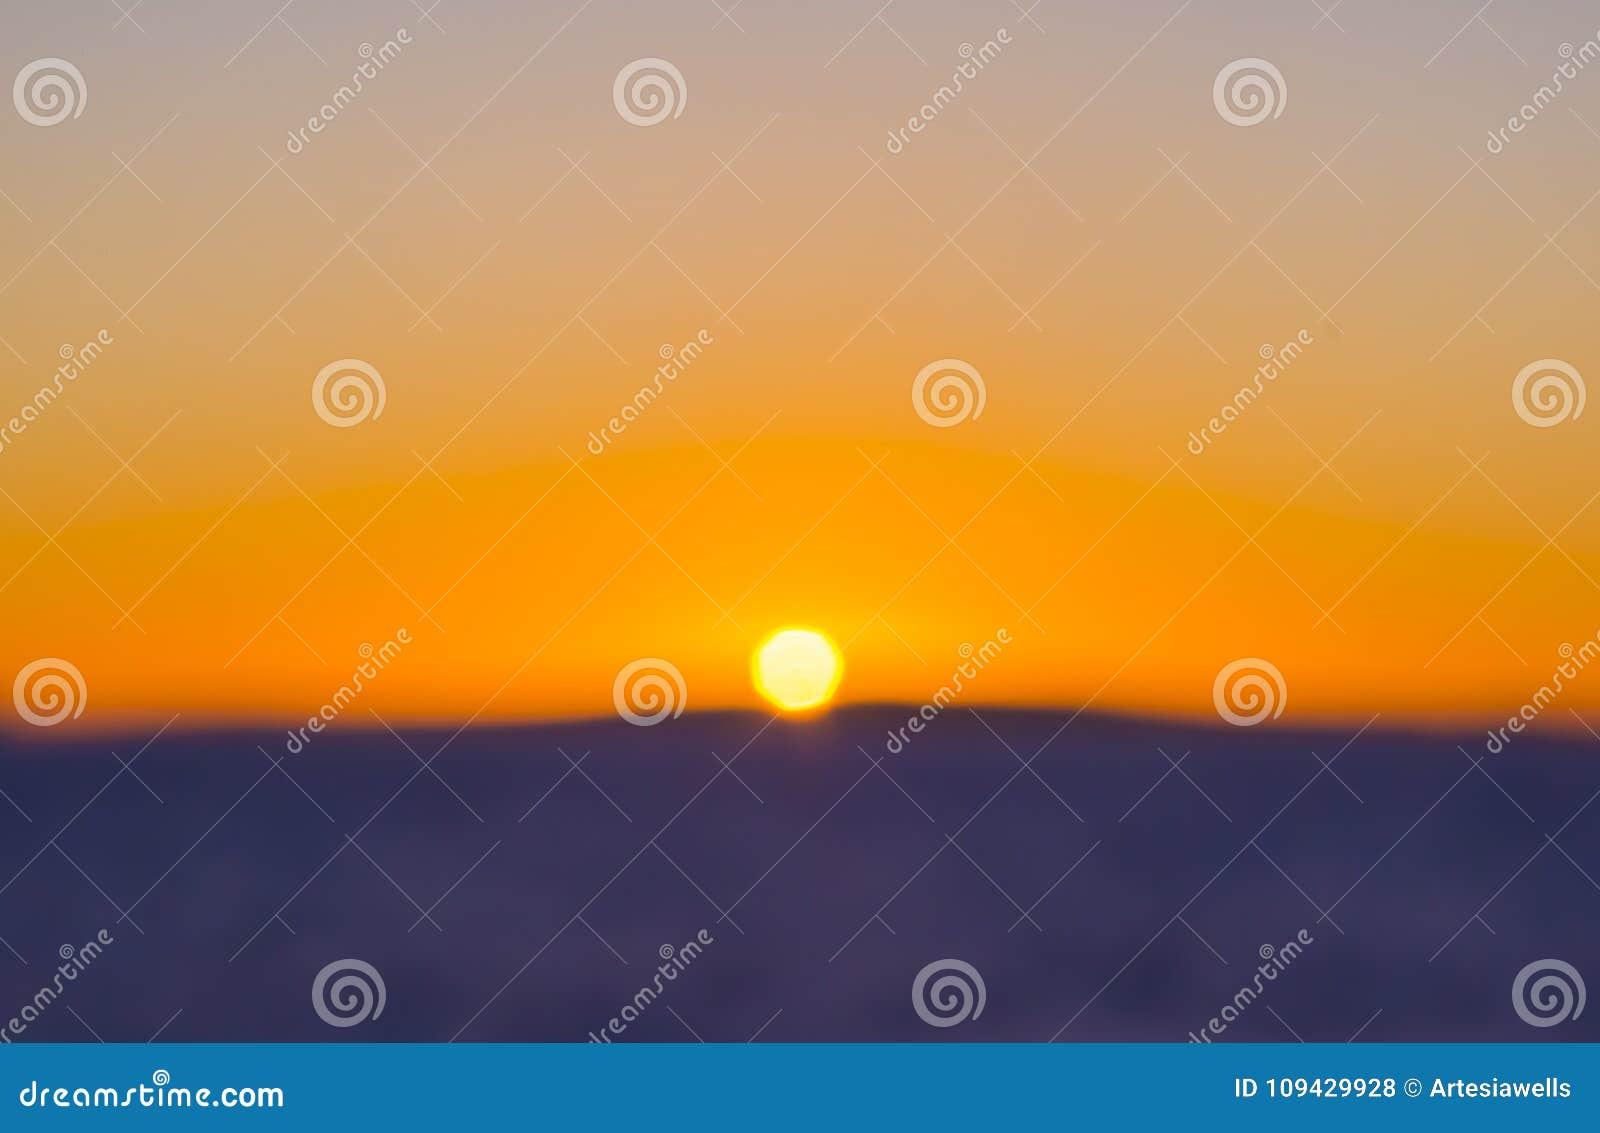 Colorful Sunset Blur